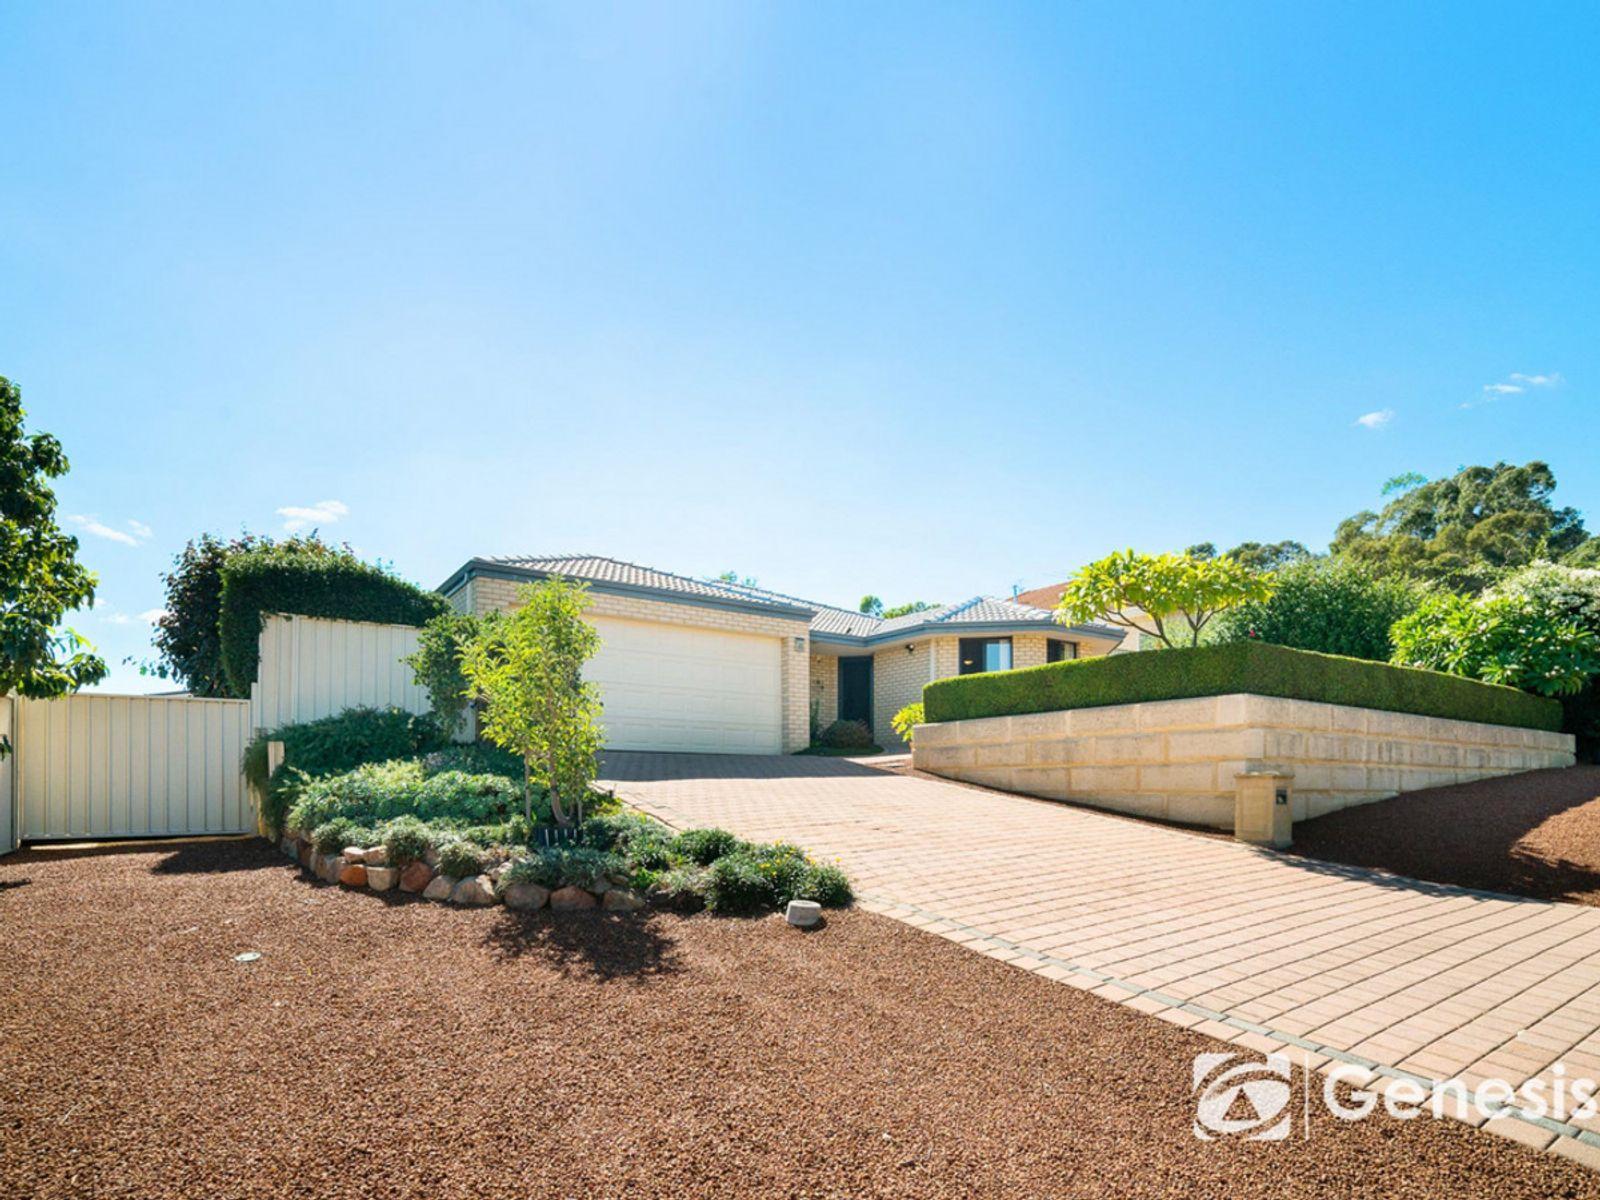 37 Beresford Gardens, Swan View, WA 6056